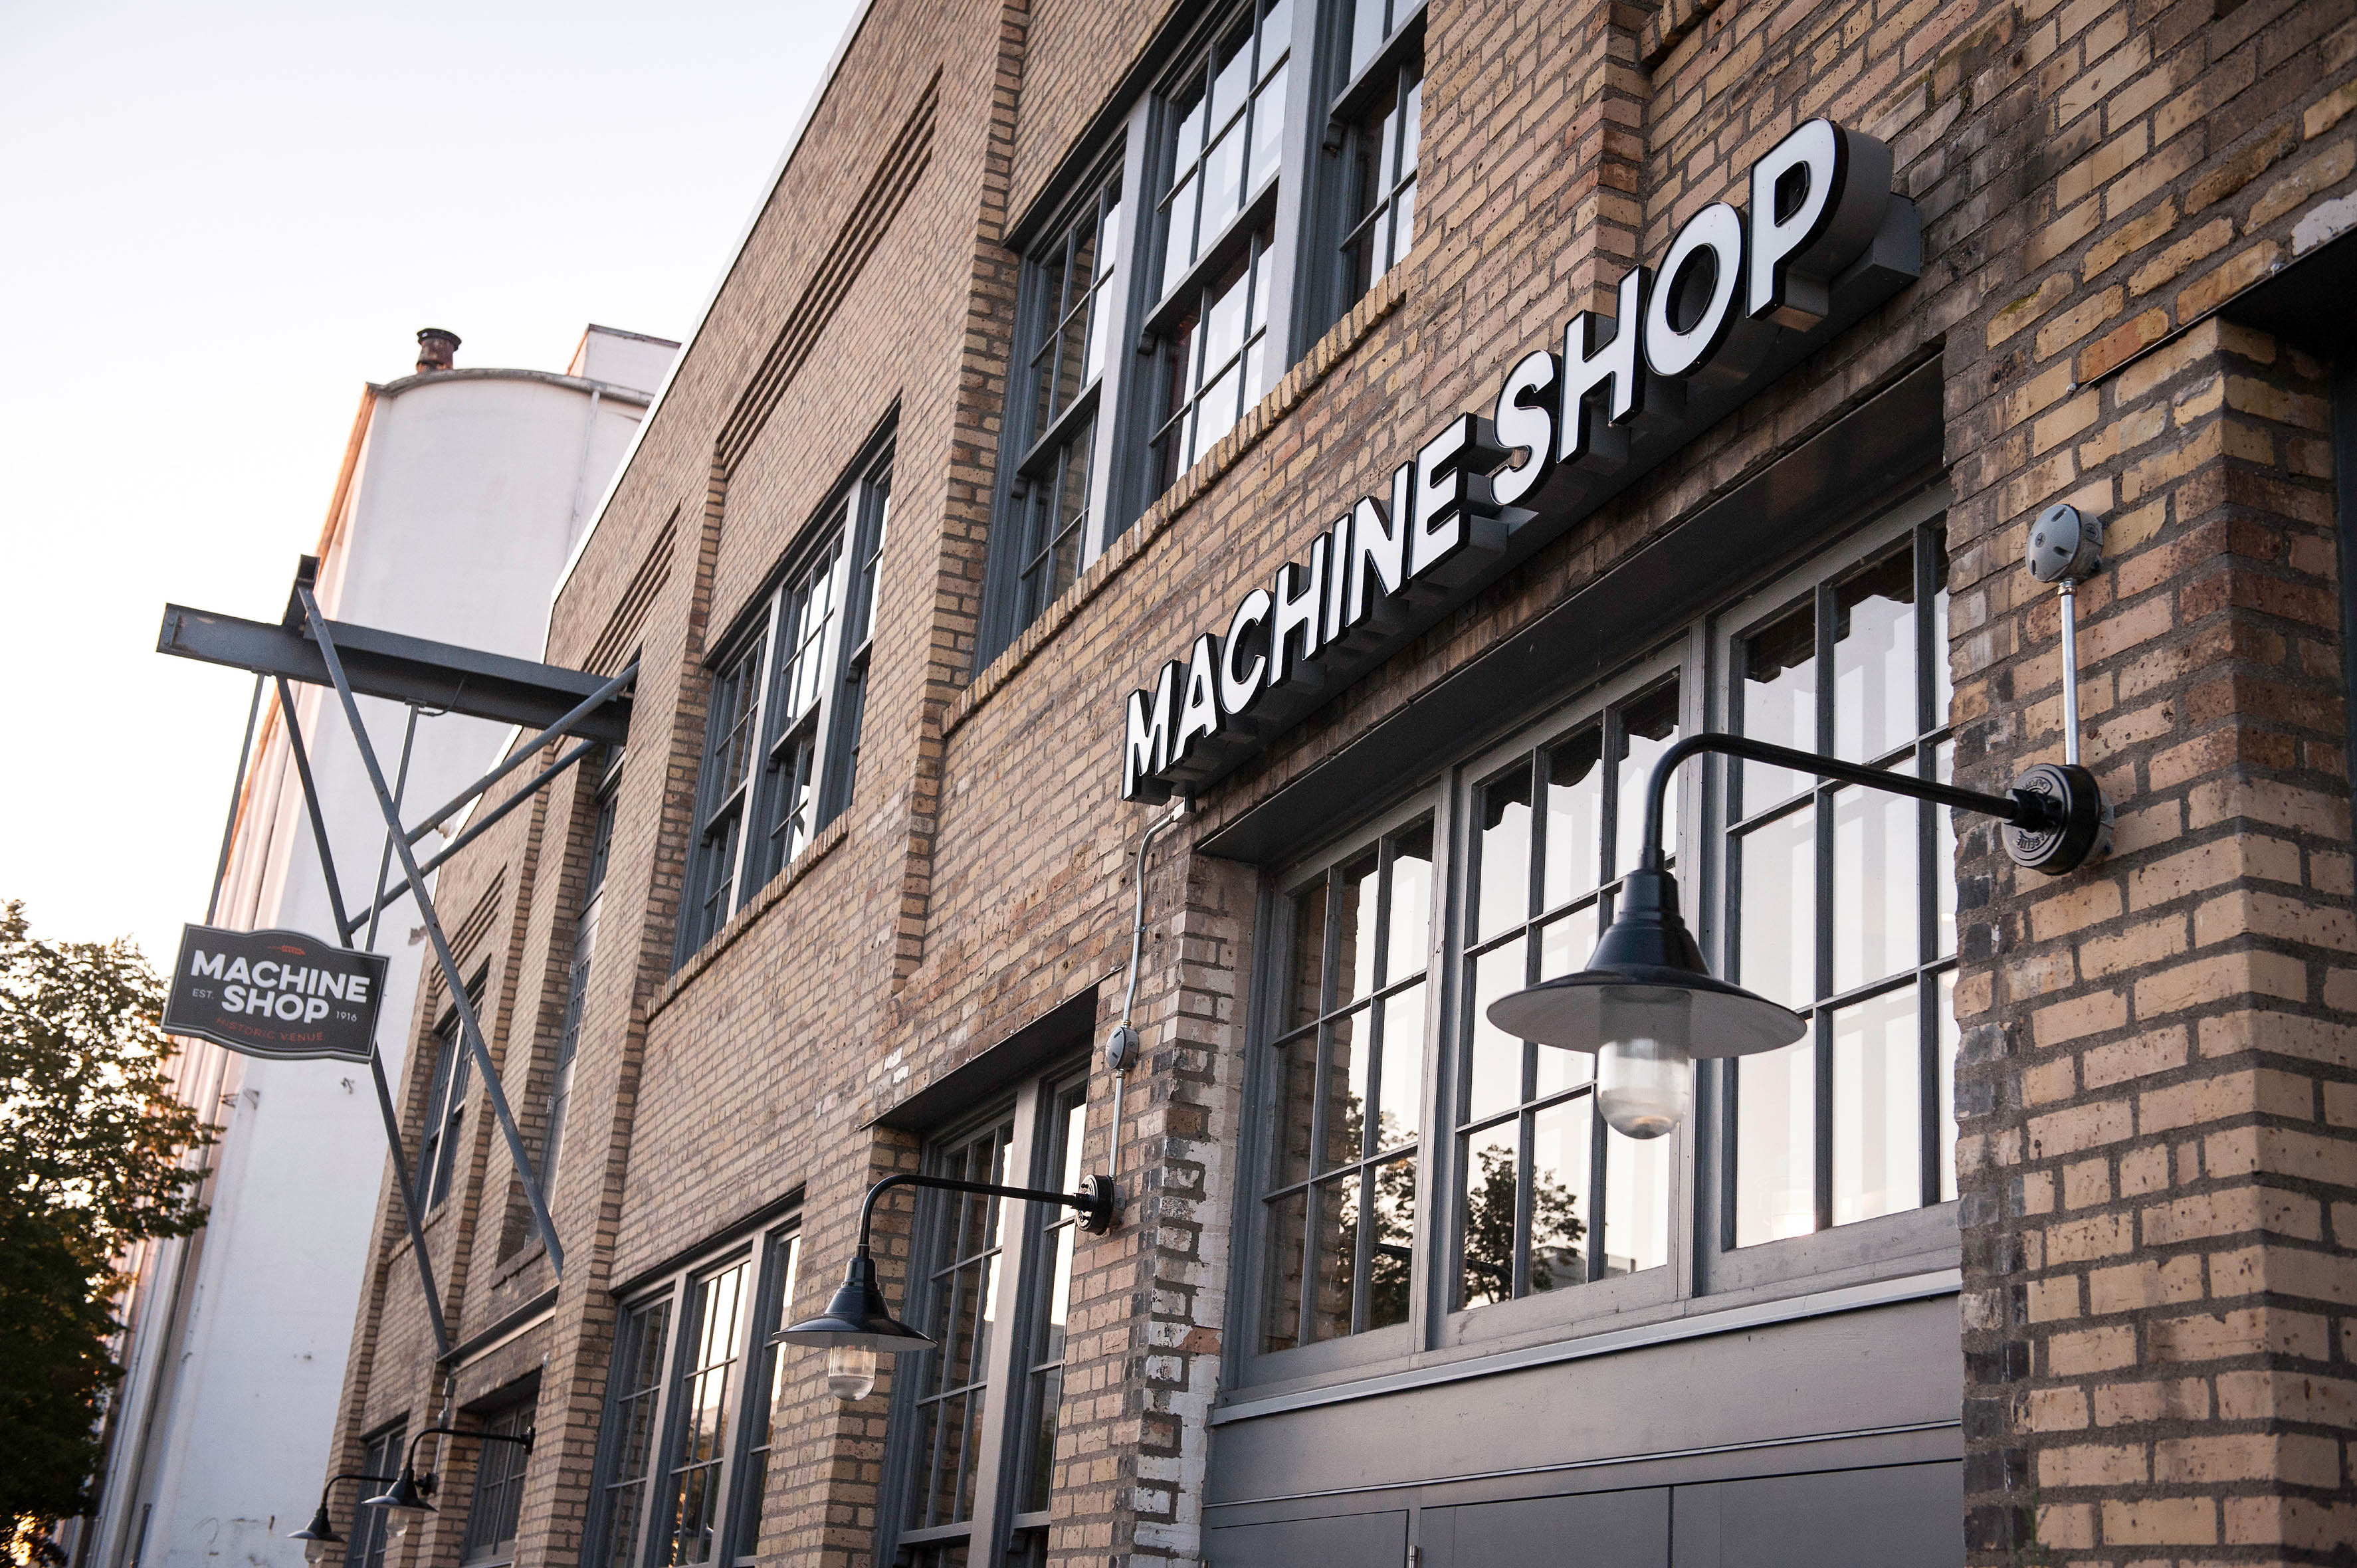 Machine Shop exterior